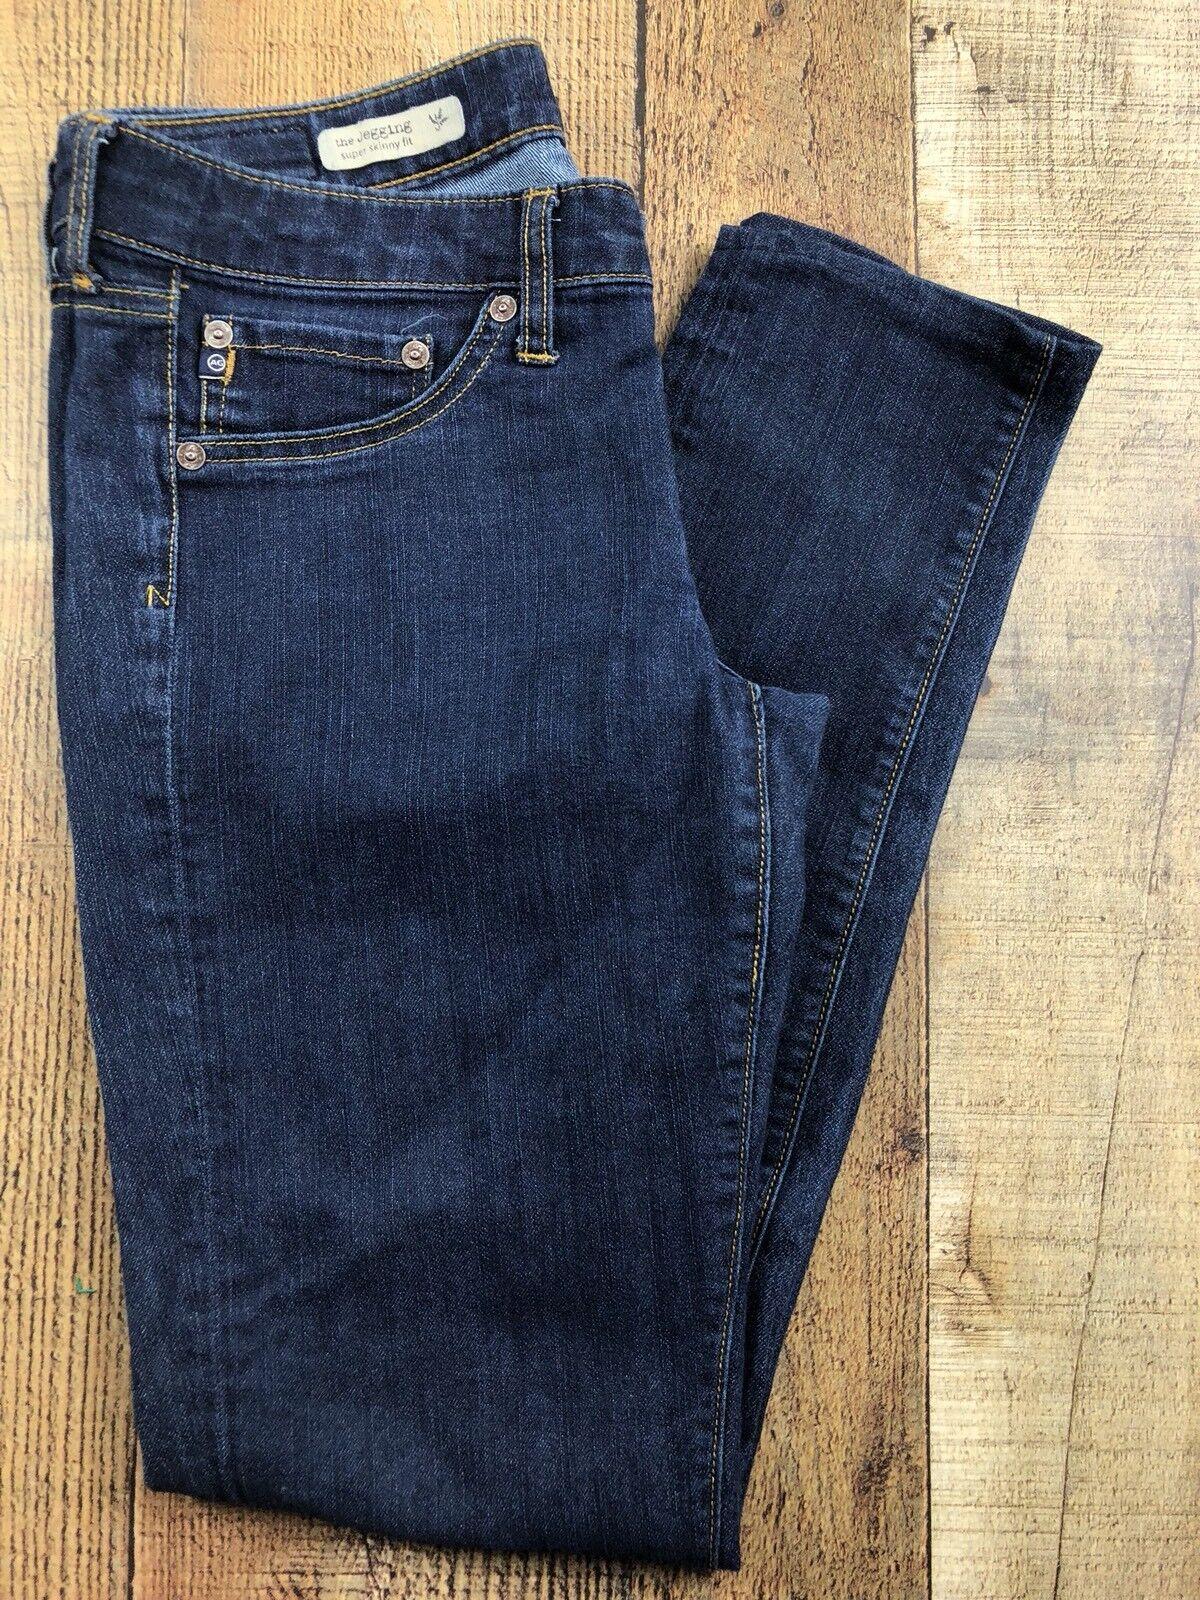 Adriano goldschmied The Jegging Super Skinny Dark Wash Jeans Size 28x28x7